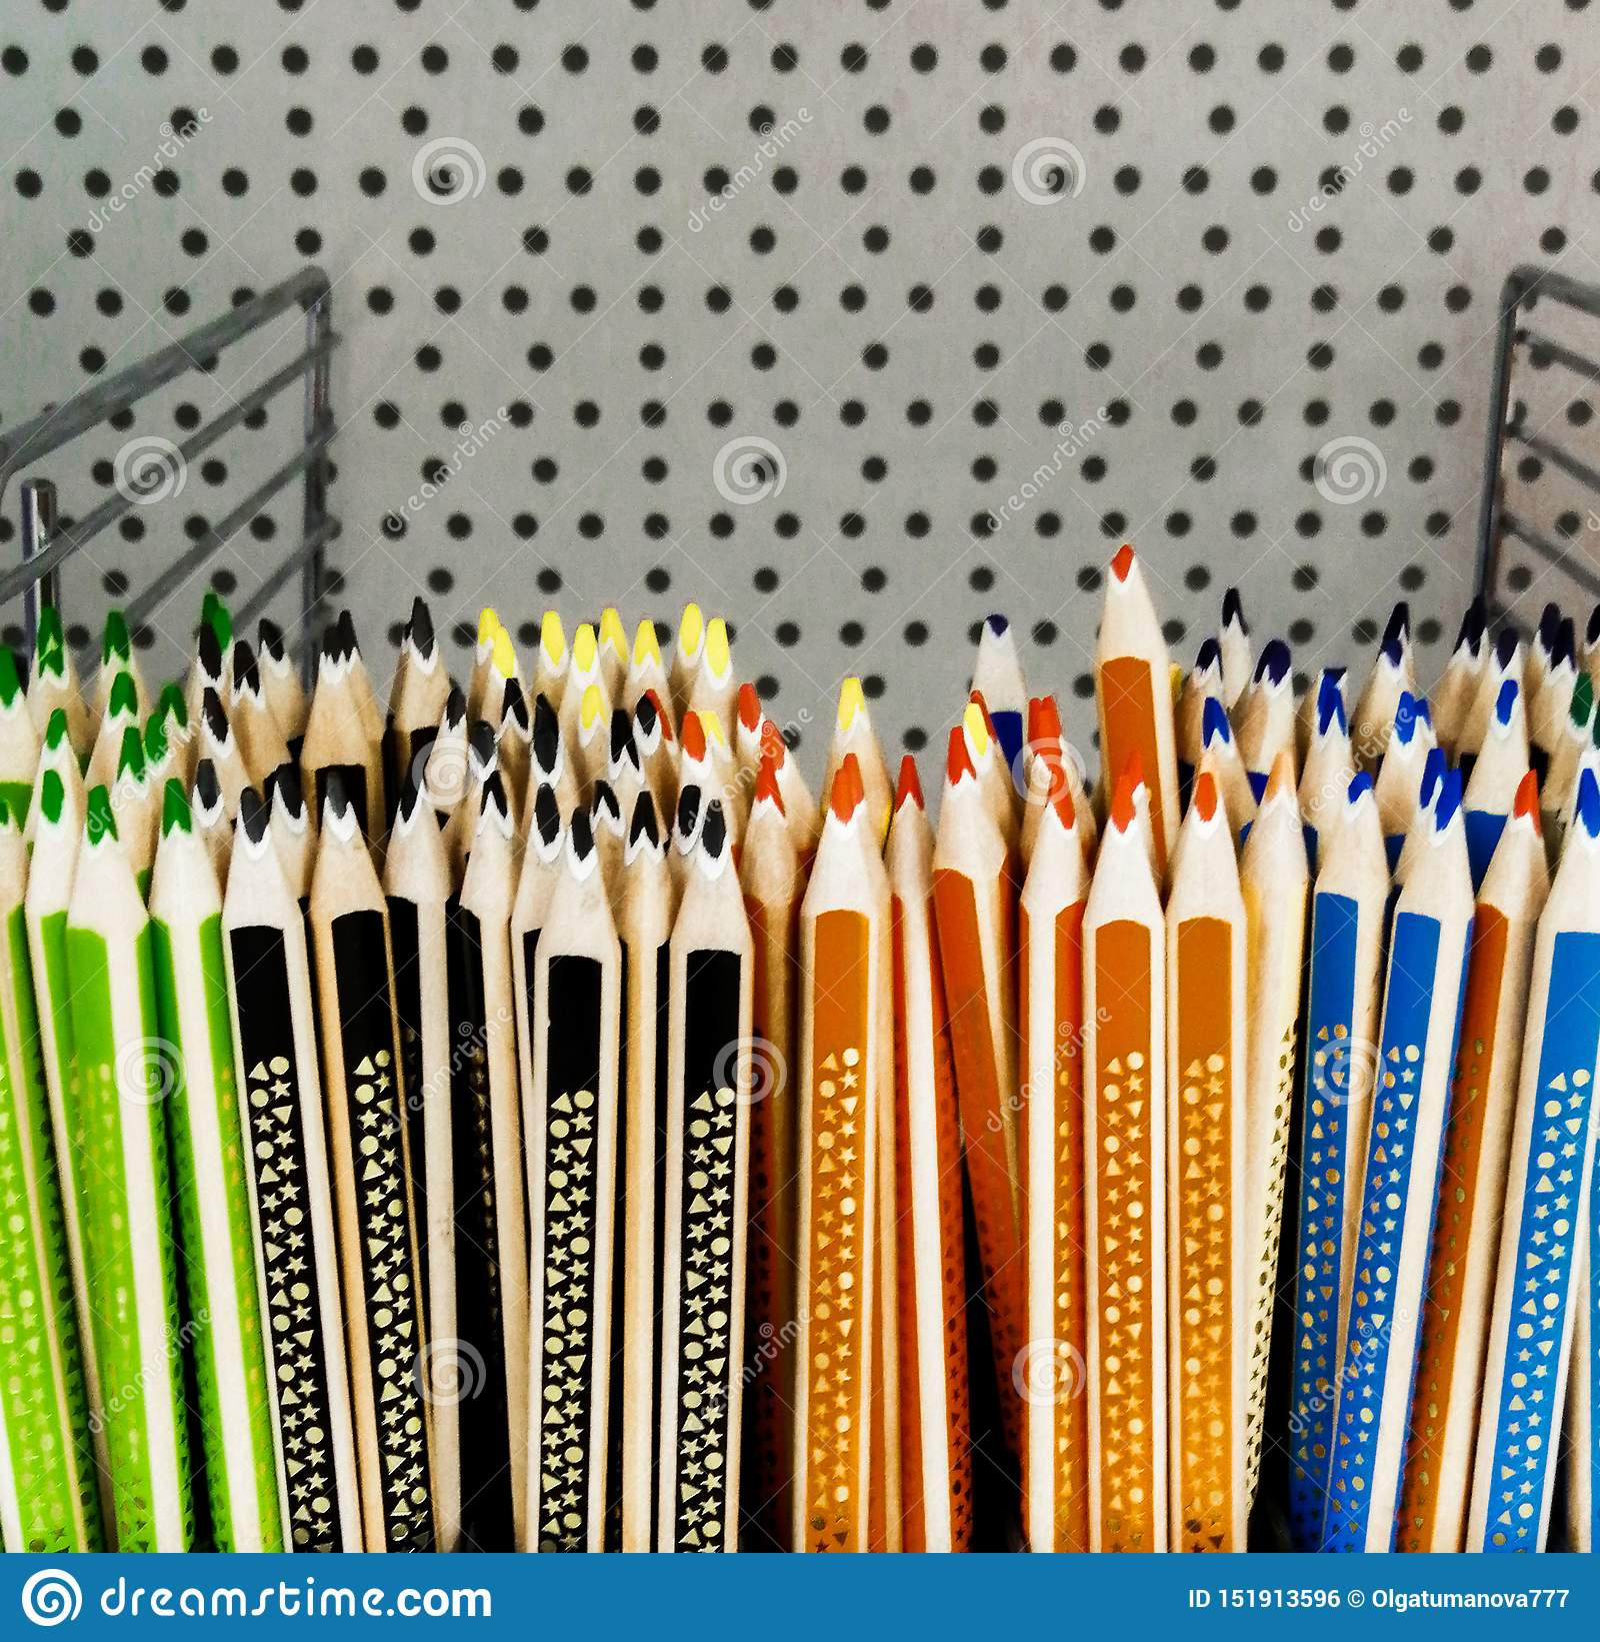 Colored pencils for sale pencils orange blue